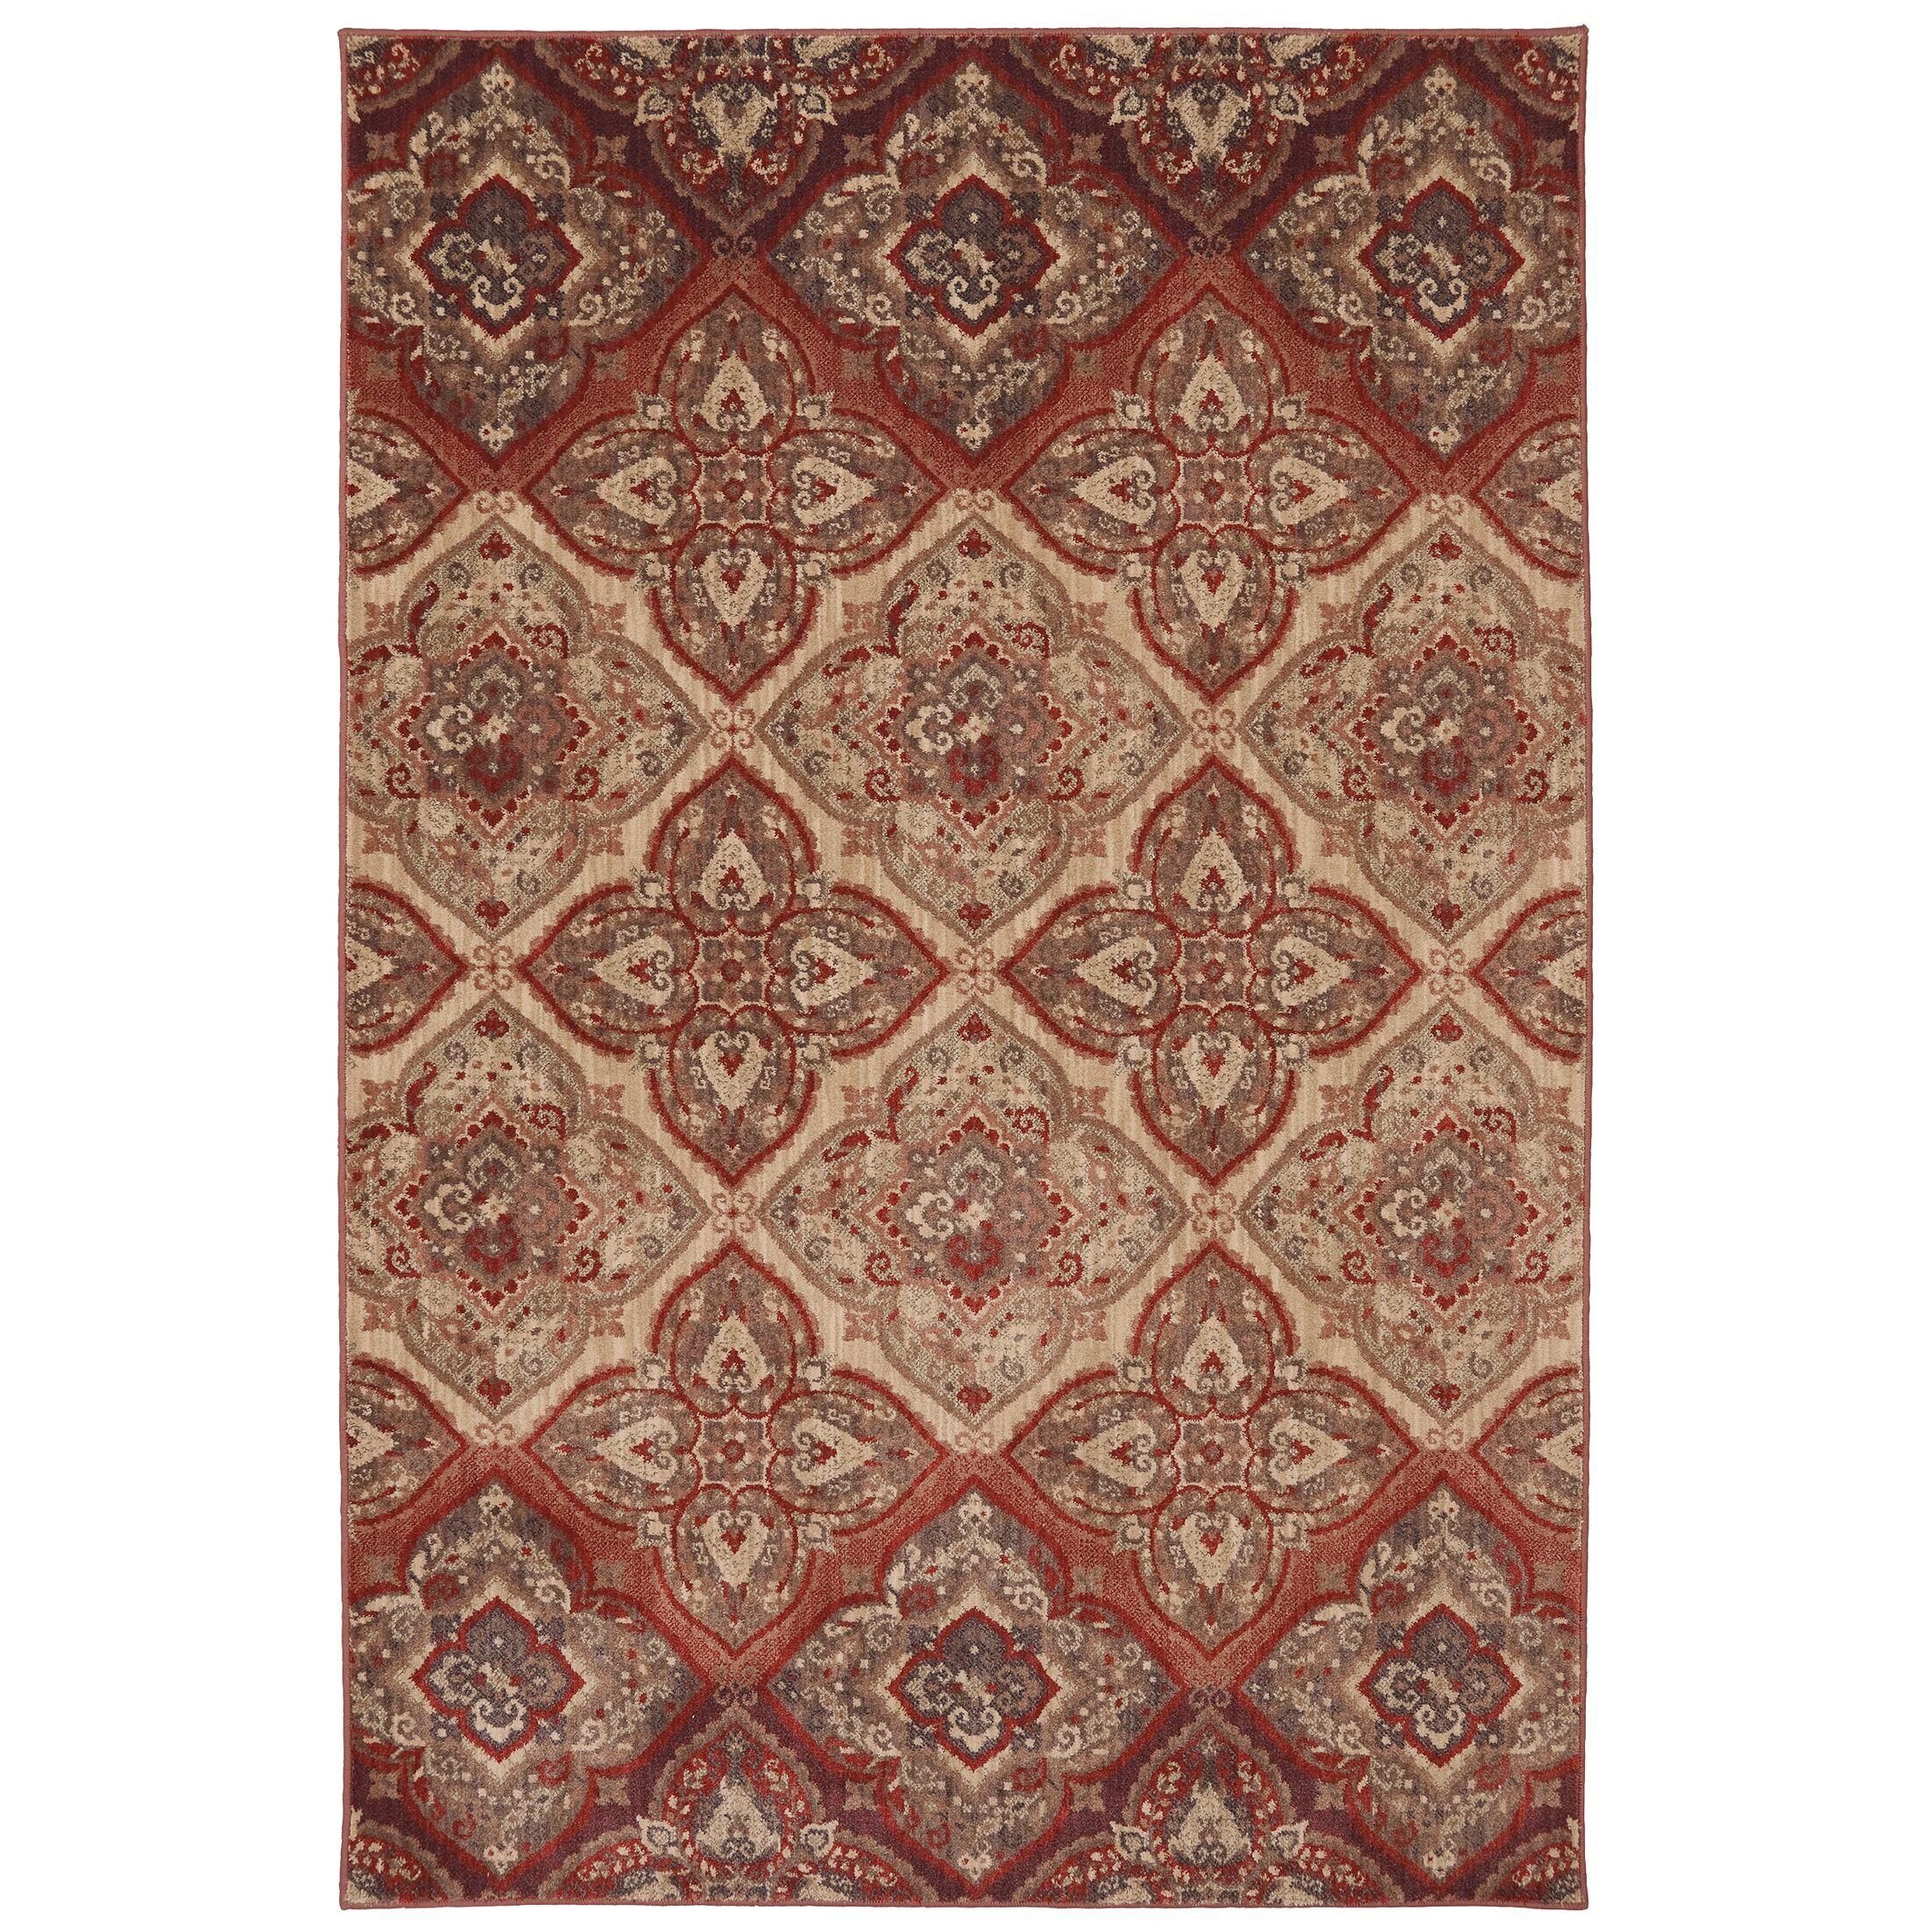 Dryden Mesquite Ornamental Chapel Rug Rug Size: Rectangle 8' x 11'